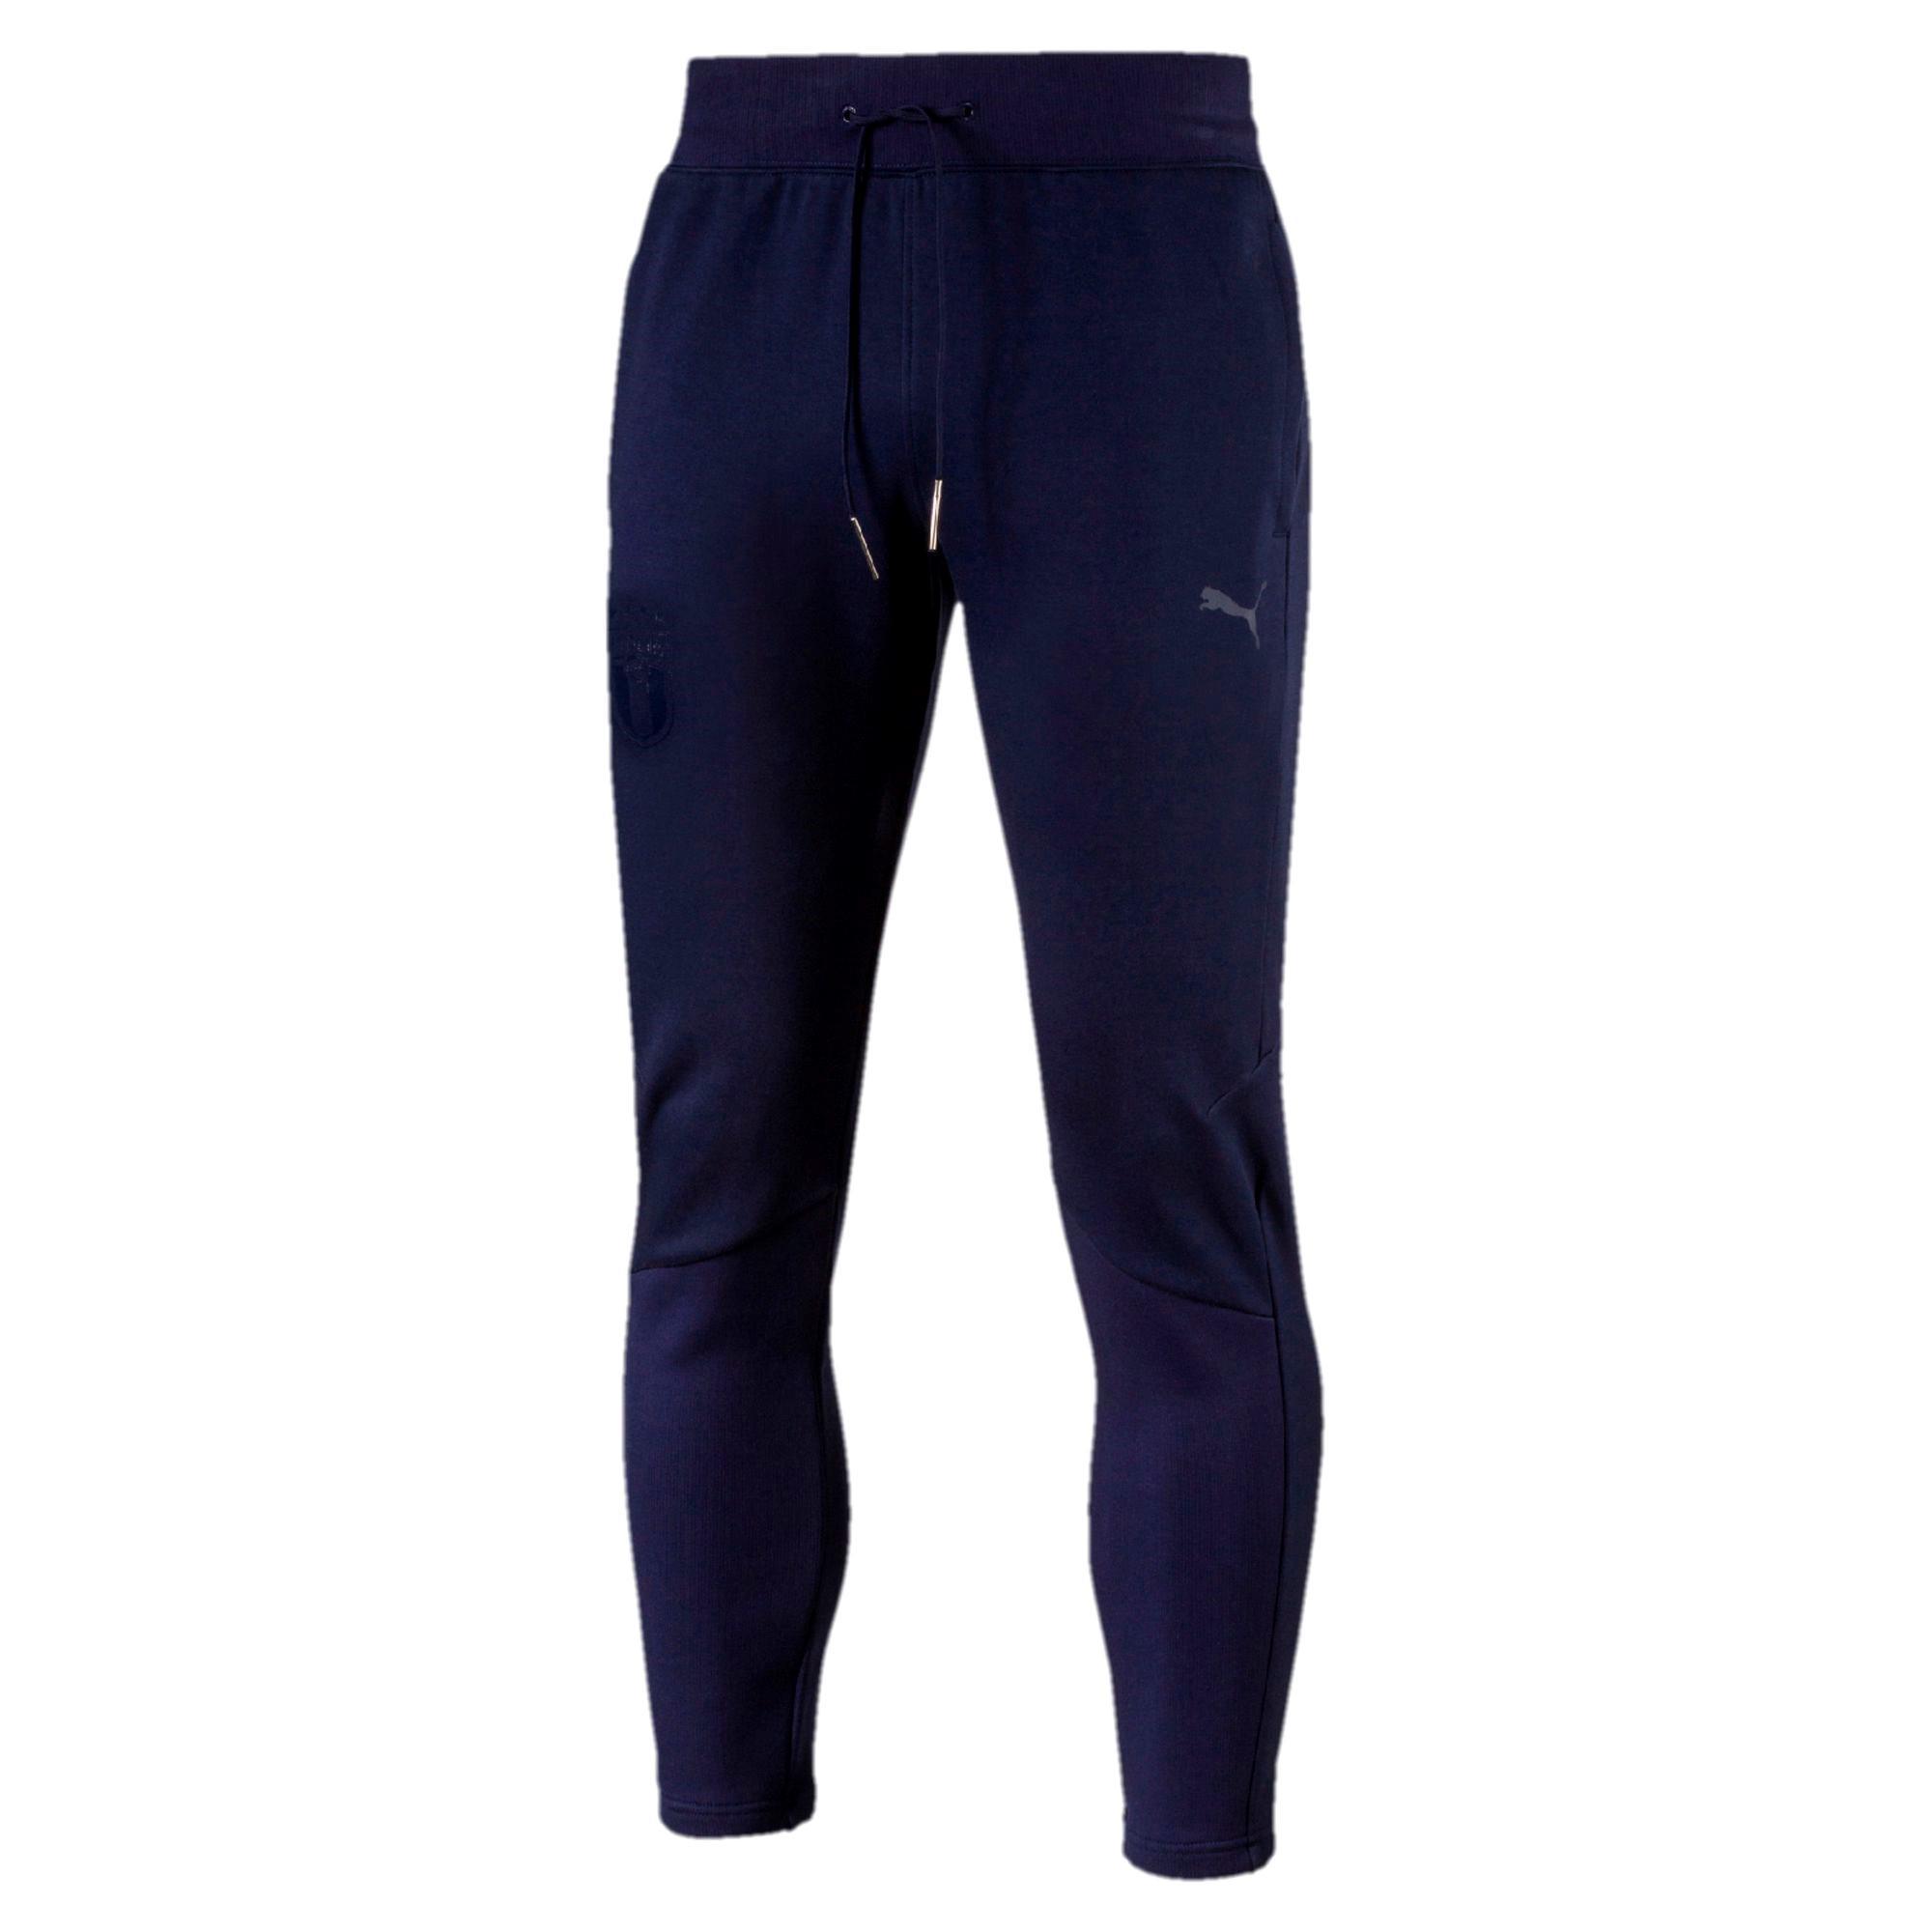 Pantaloni Figc Azzurri